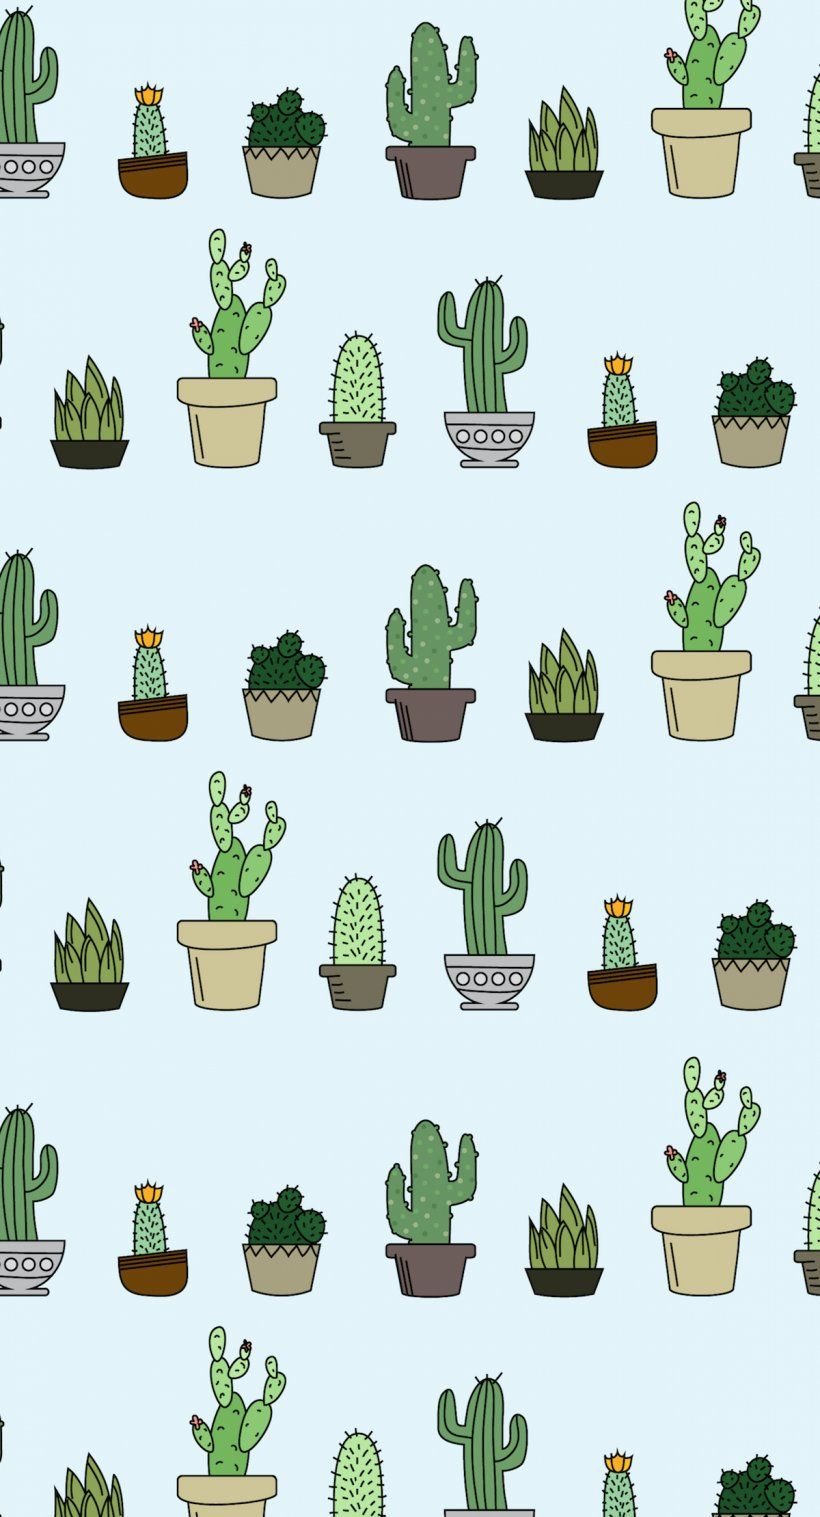 Cactus Desktop Wallpapers On Wallpaperdog